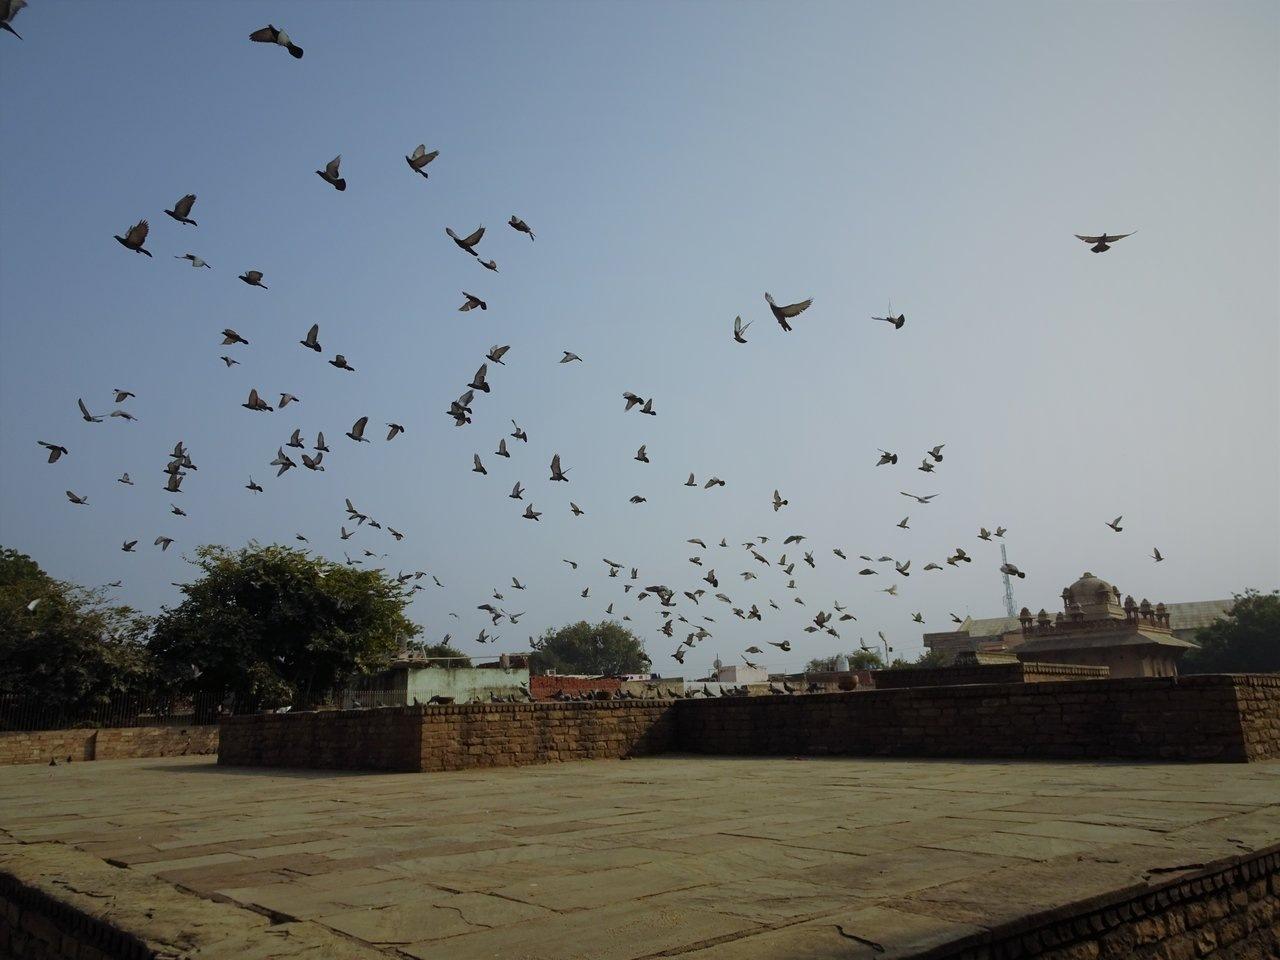 Pigeons in flight - Tansen Tomb